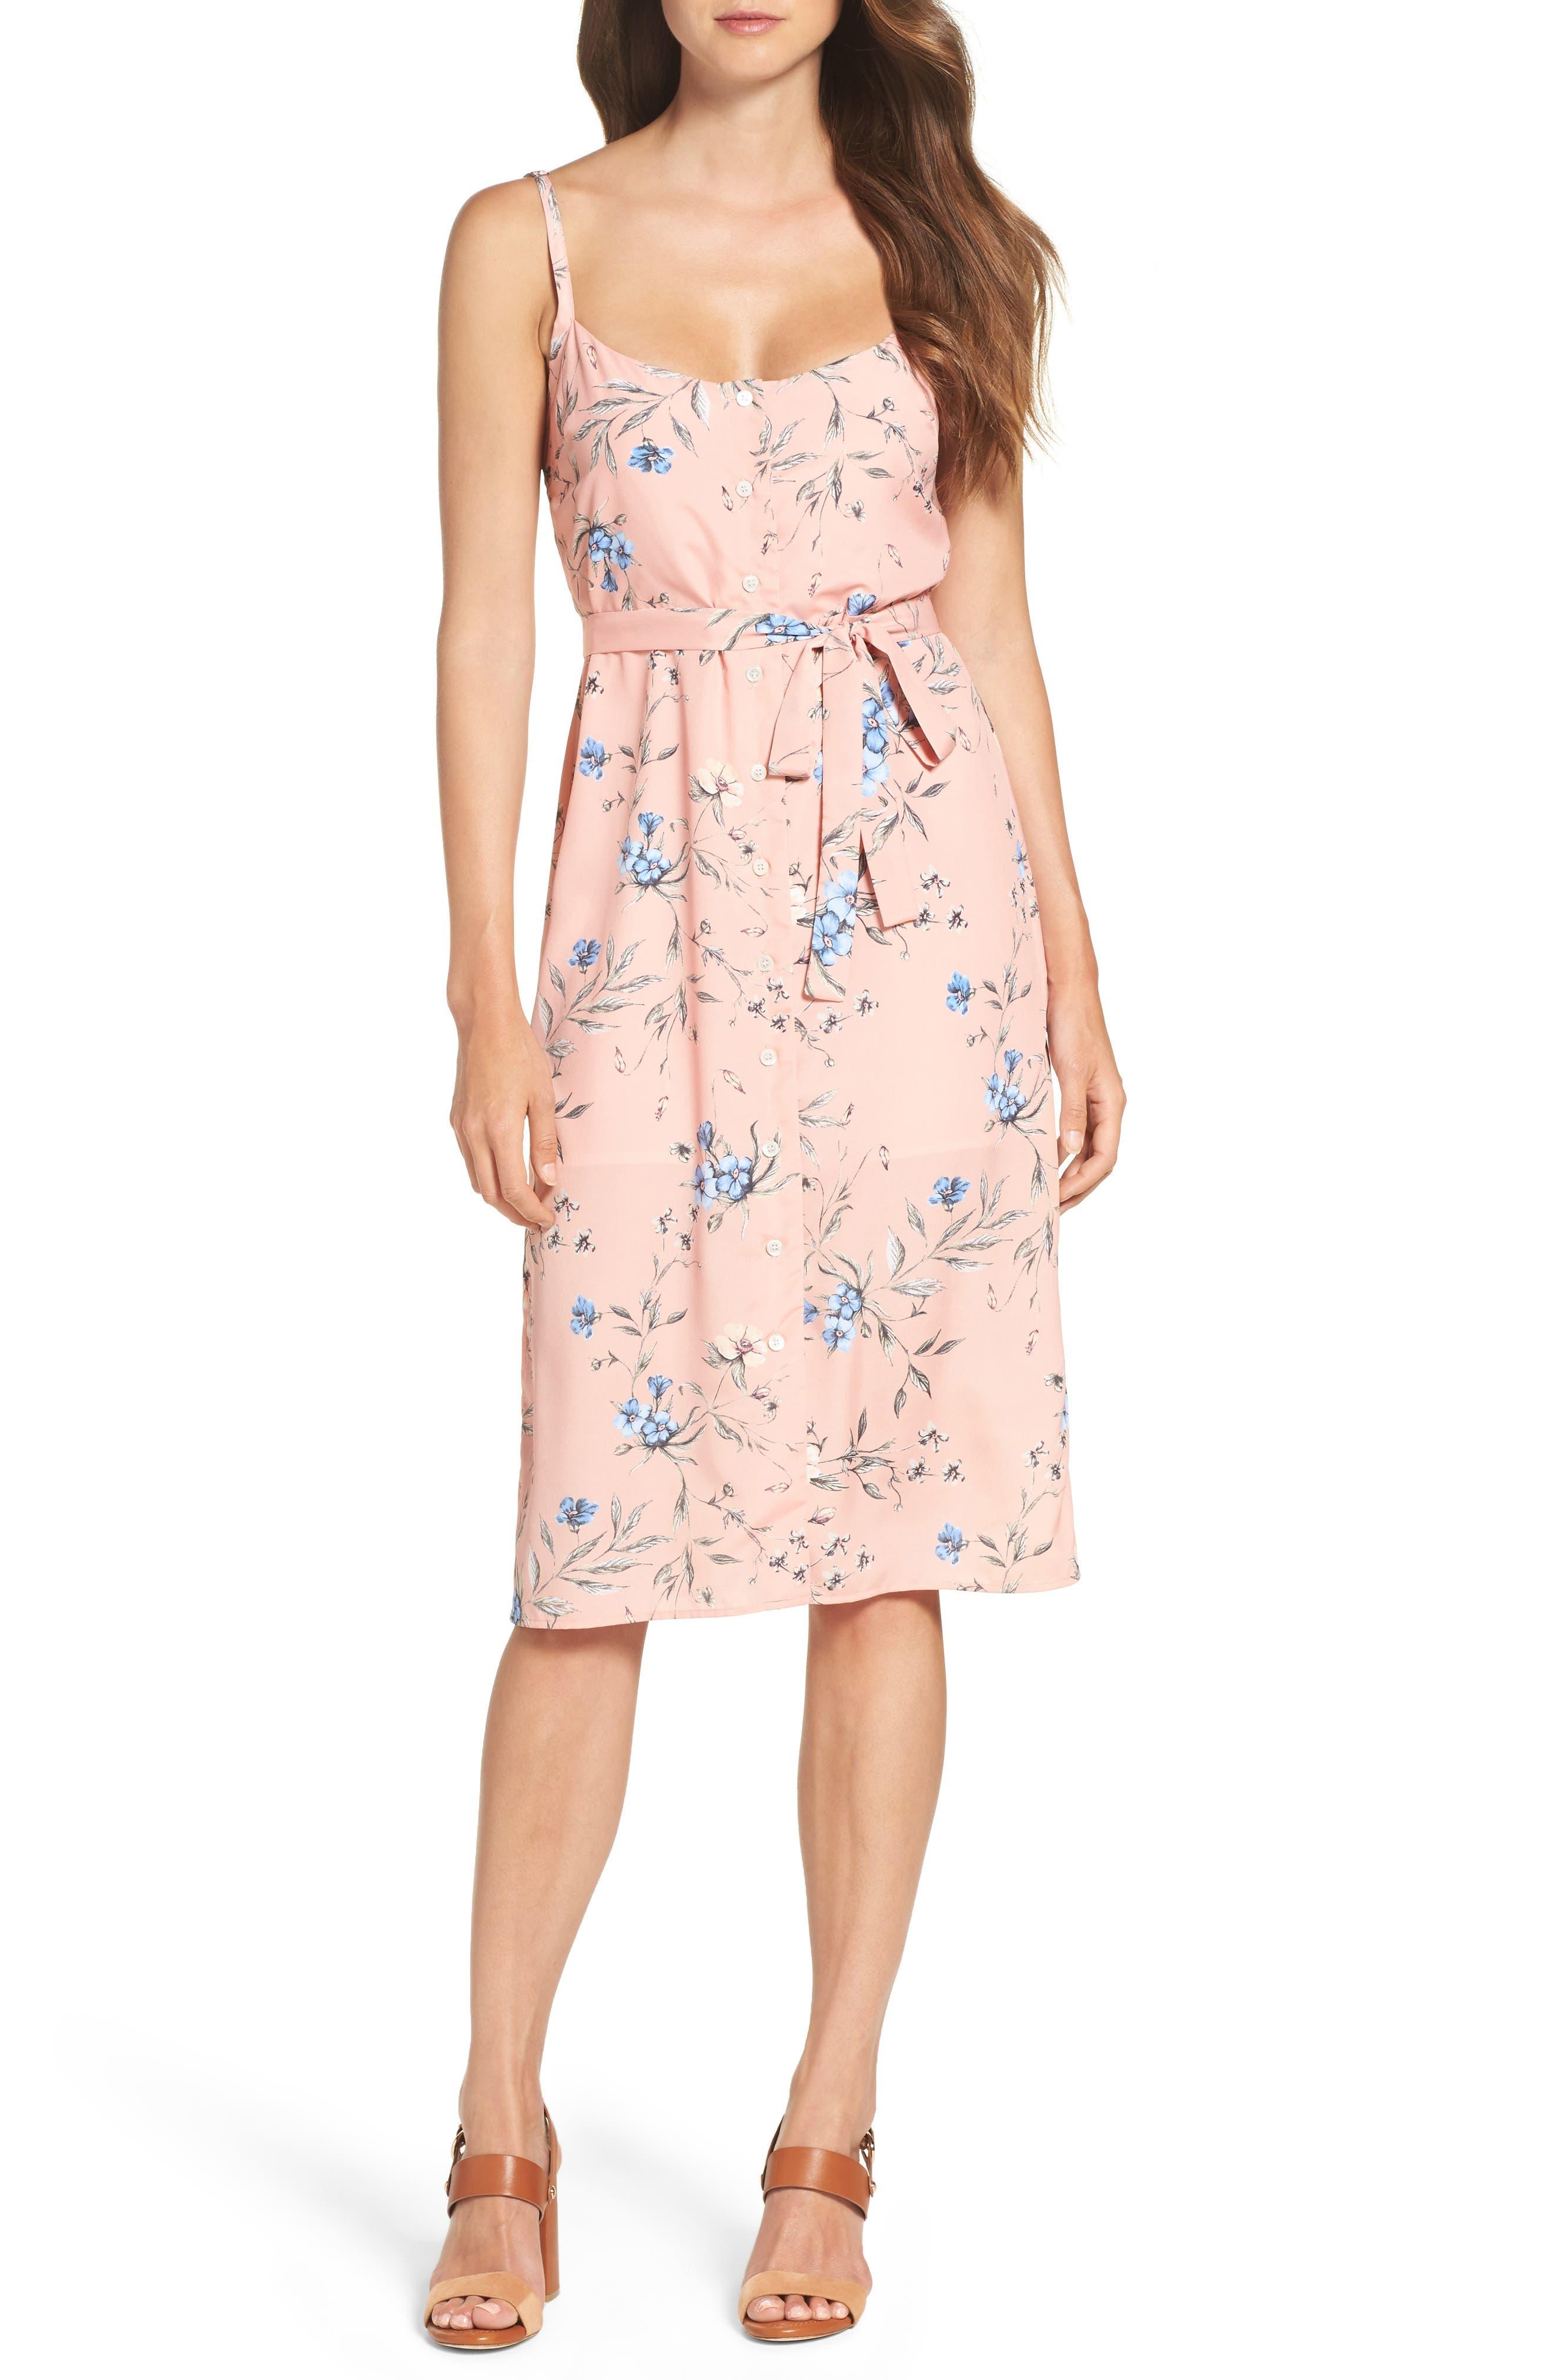 Alternate Image 1 Selected - Ali & Jay Flower Frolicking Midi Dress